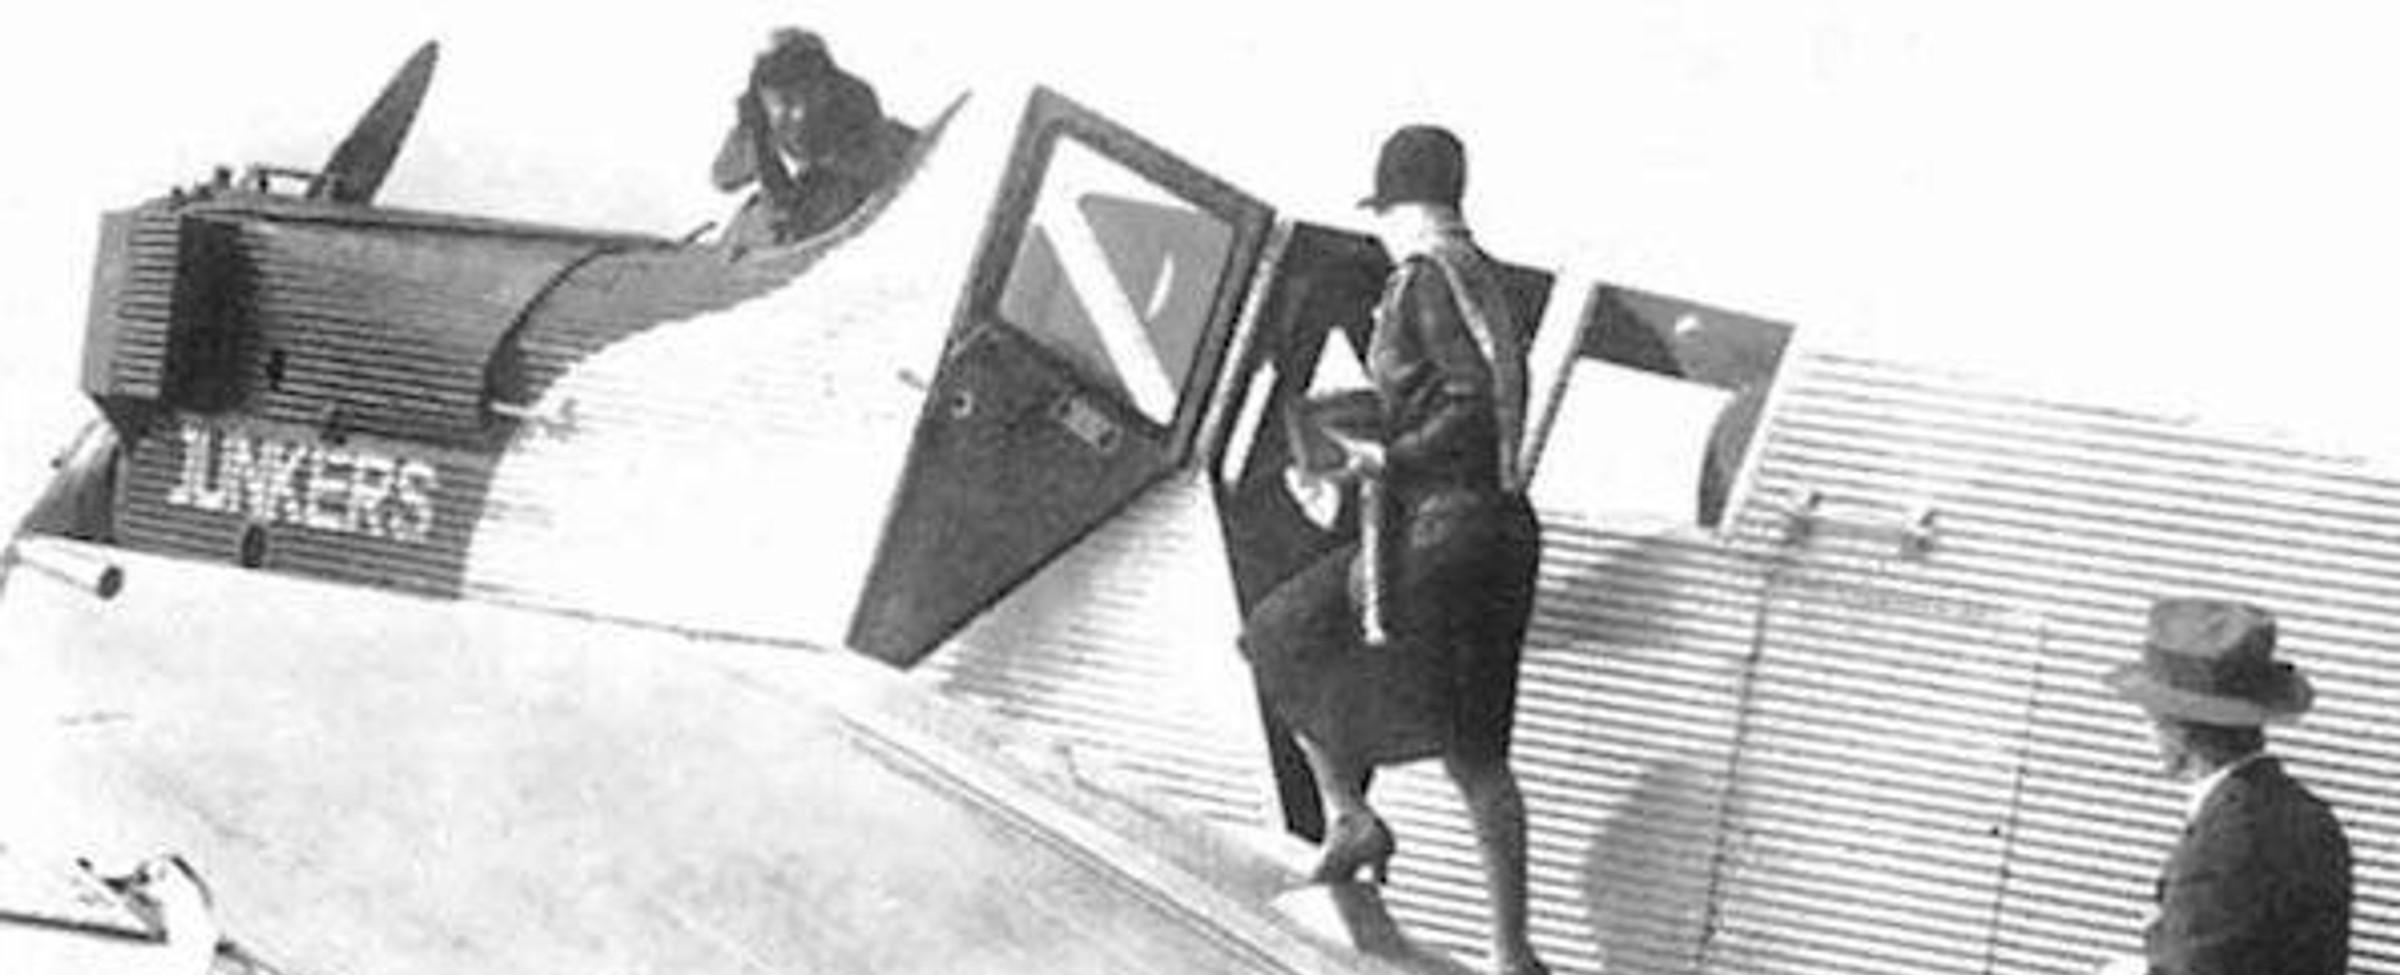 Historie britské monarchie pohledem z letadla